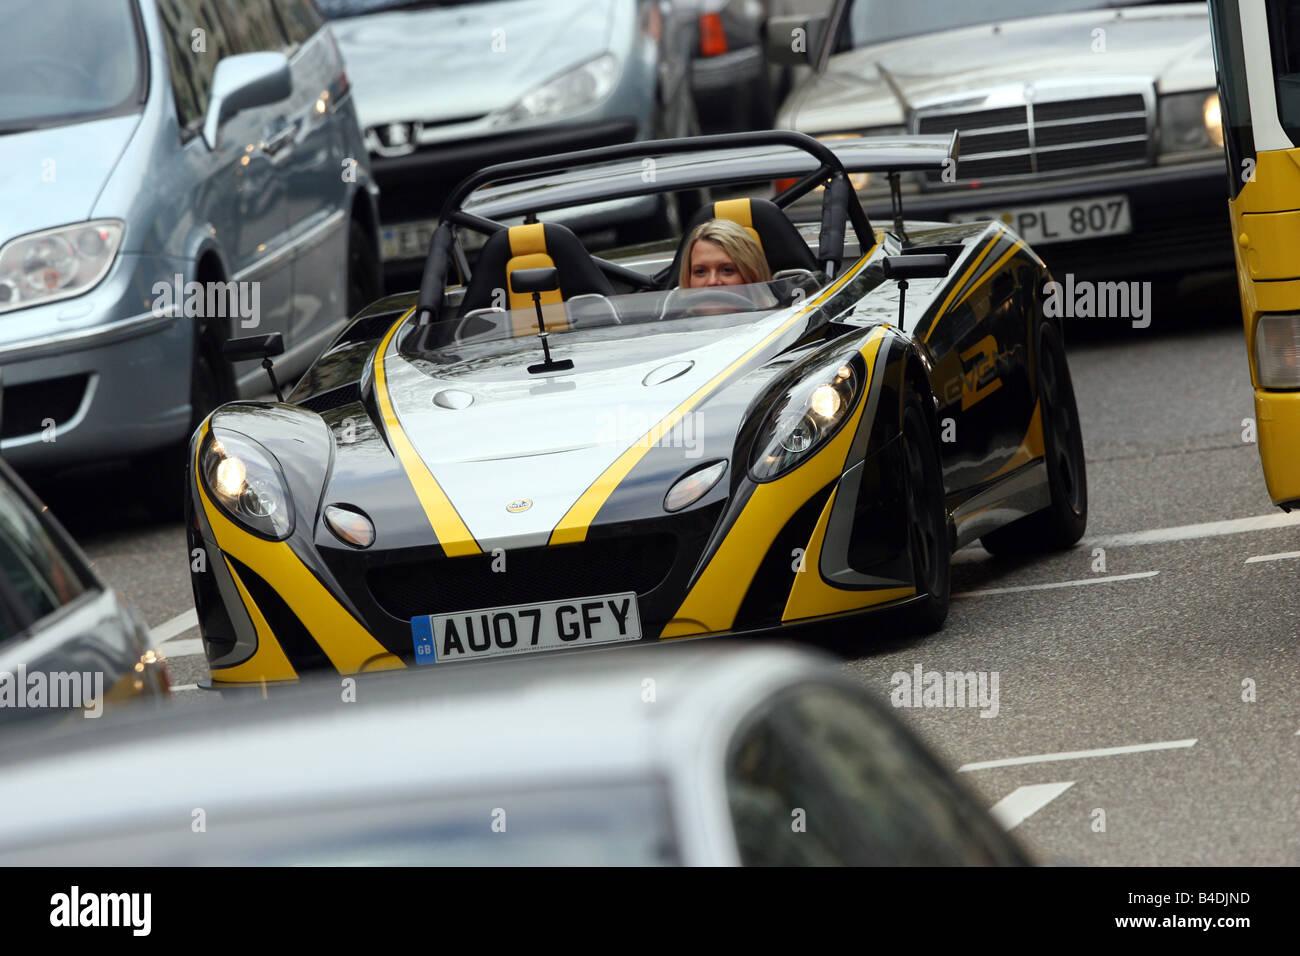 http://c8.alamy.com/comp/B4DJND/lotus-2-eleven-model-year-2007-black-yellow-driving-standing-upholding-B4DJND.jpg